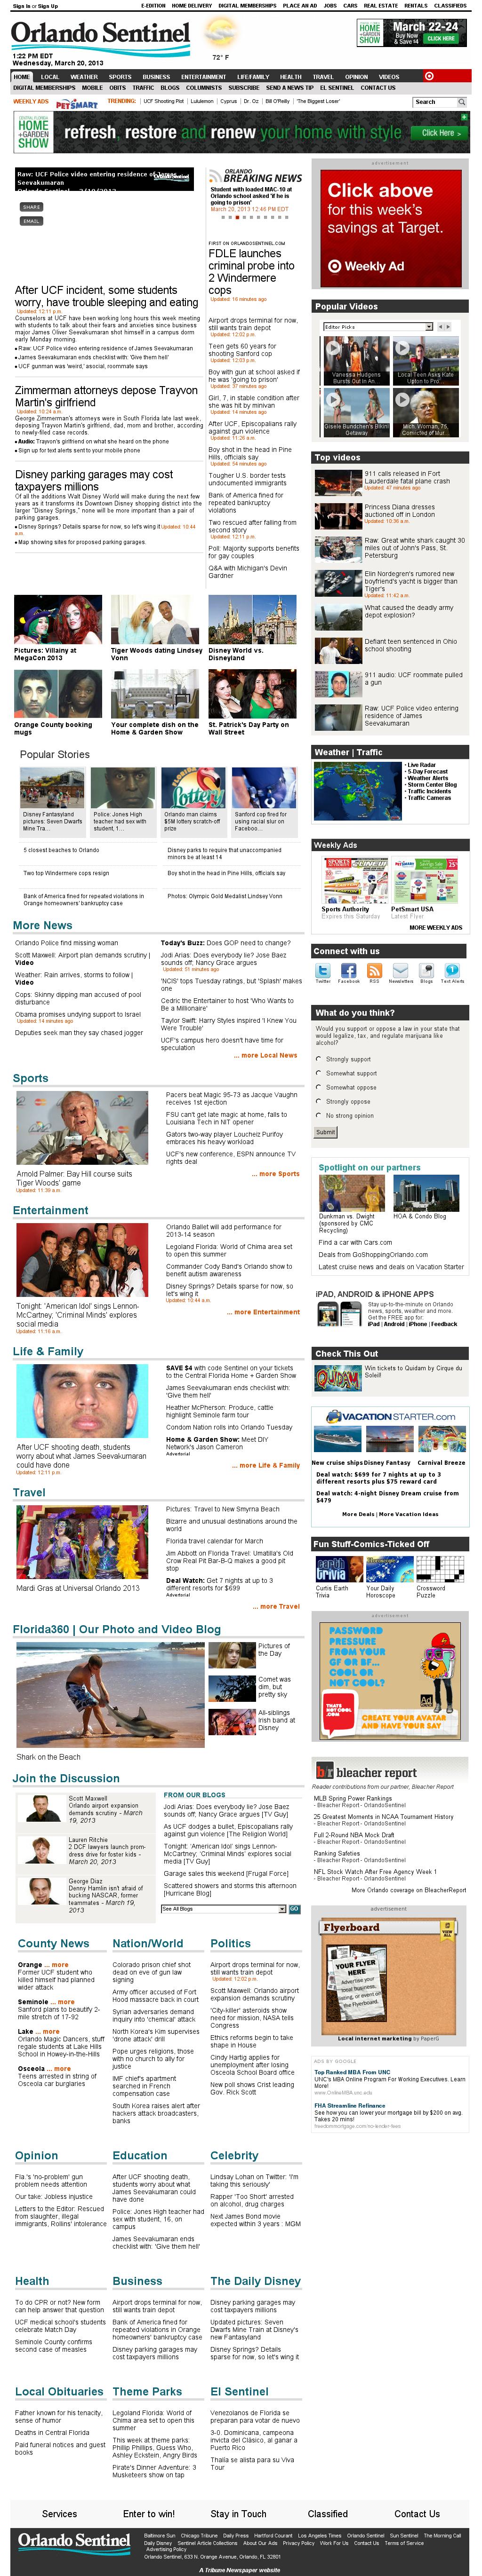 Orlando Sentinel at Wednesday March 20, 2013, 5:22 p.m. UTC